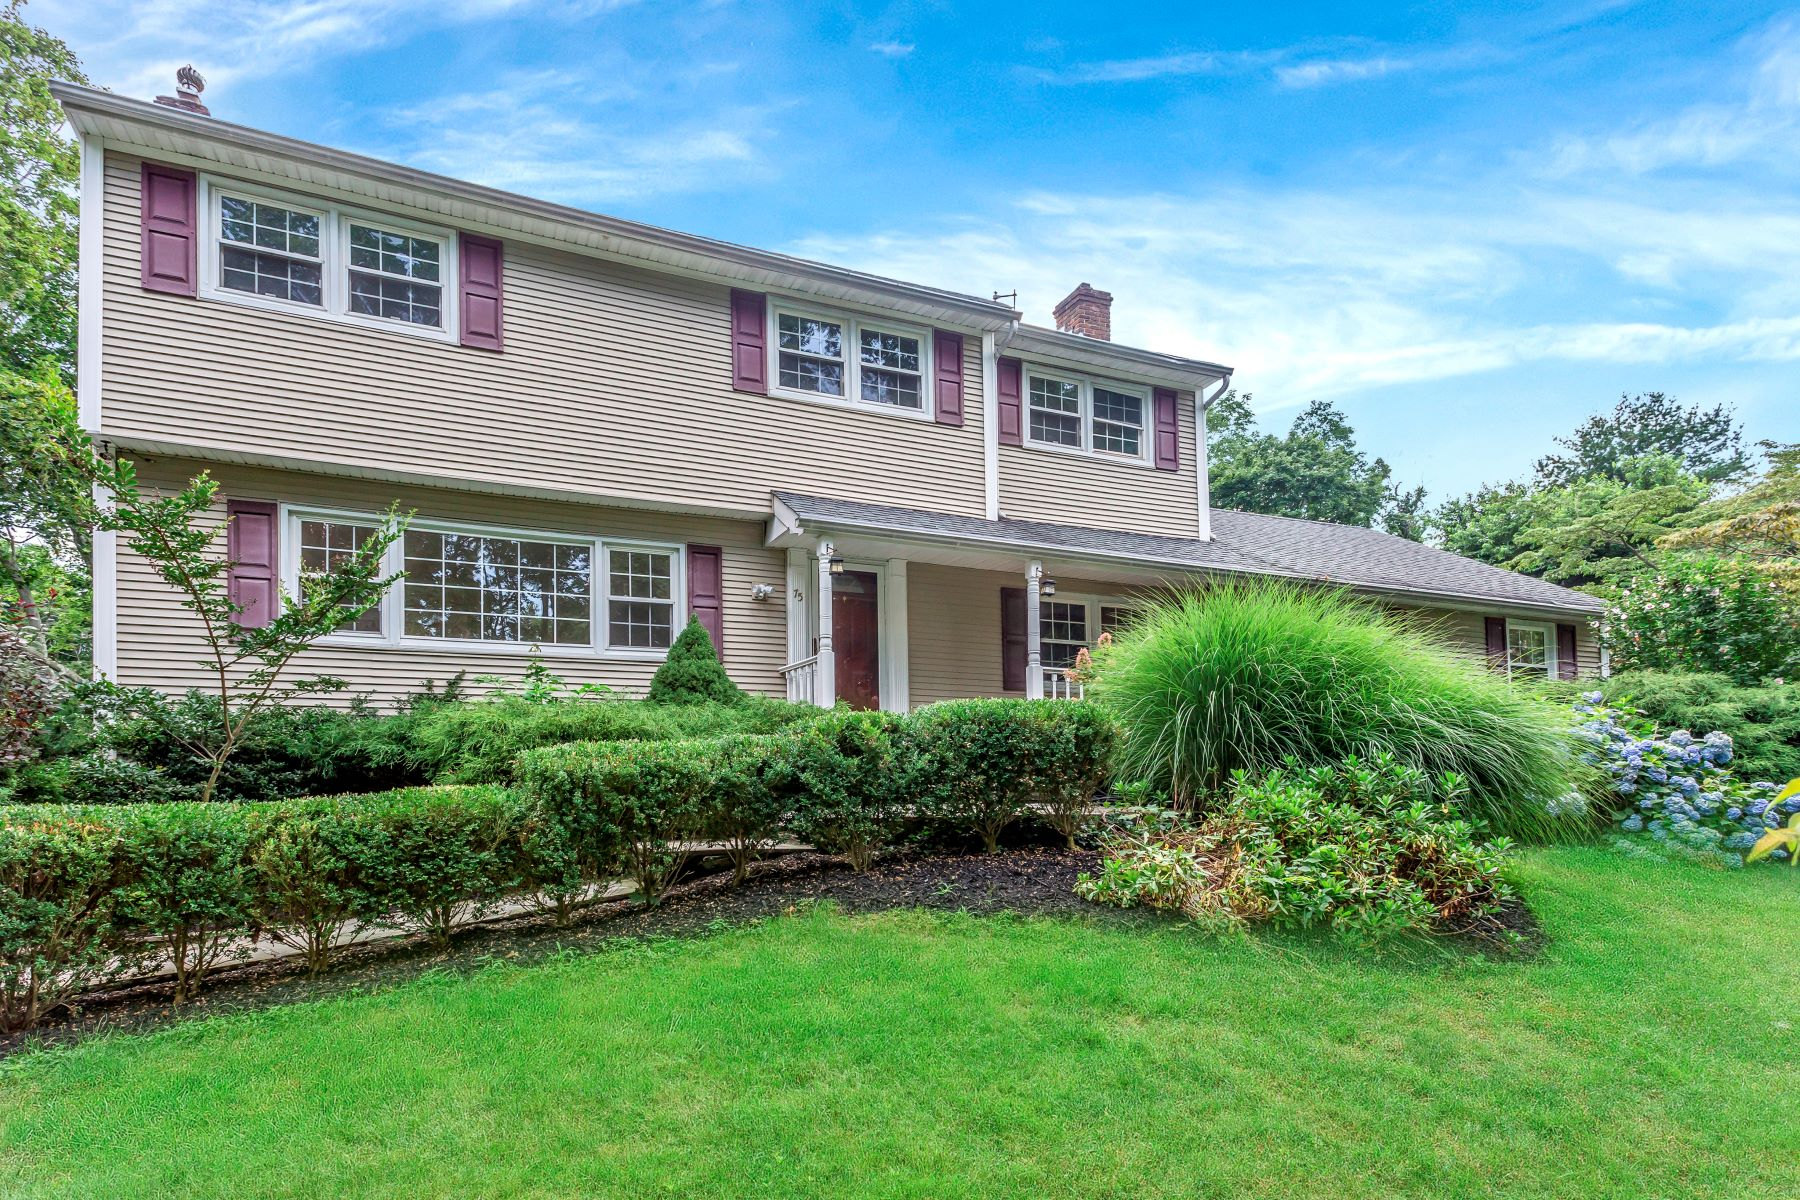 Single Family Home for Sale at 75 Main Street, Setauket, NY 11733 75 Main St, Setauket, New York, 11733 United States